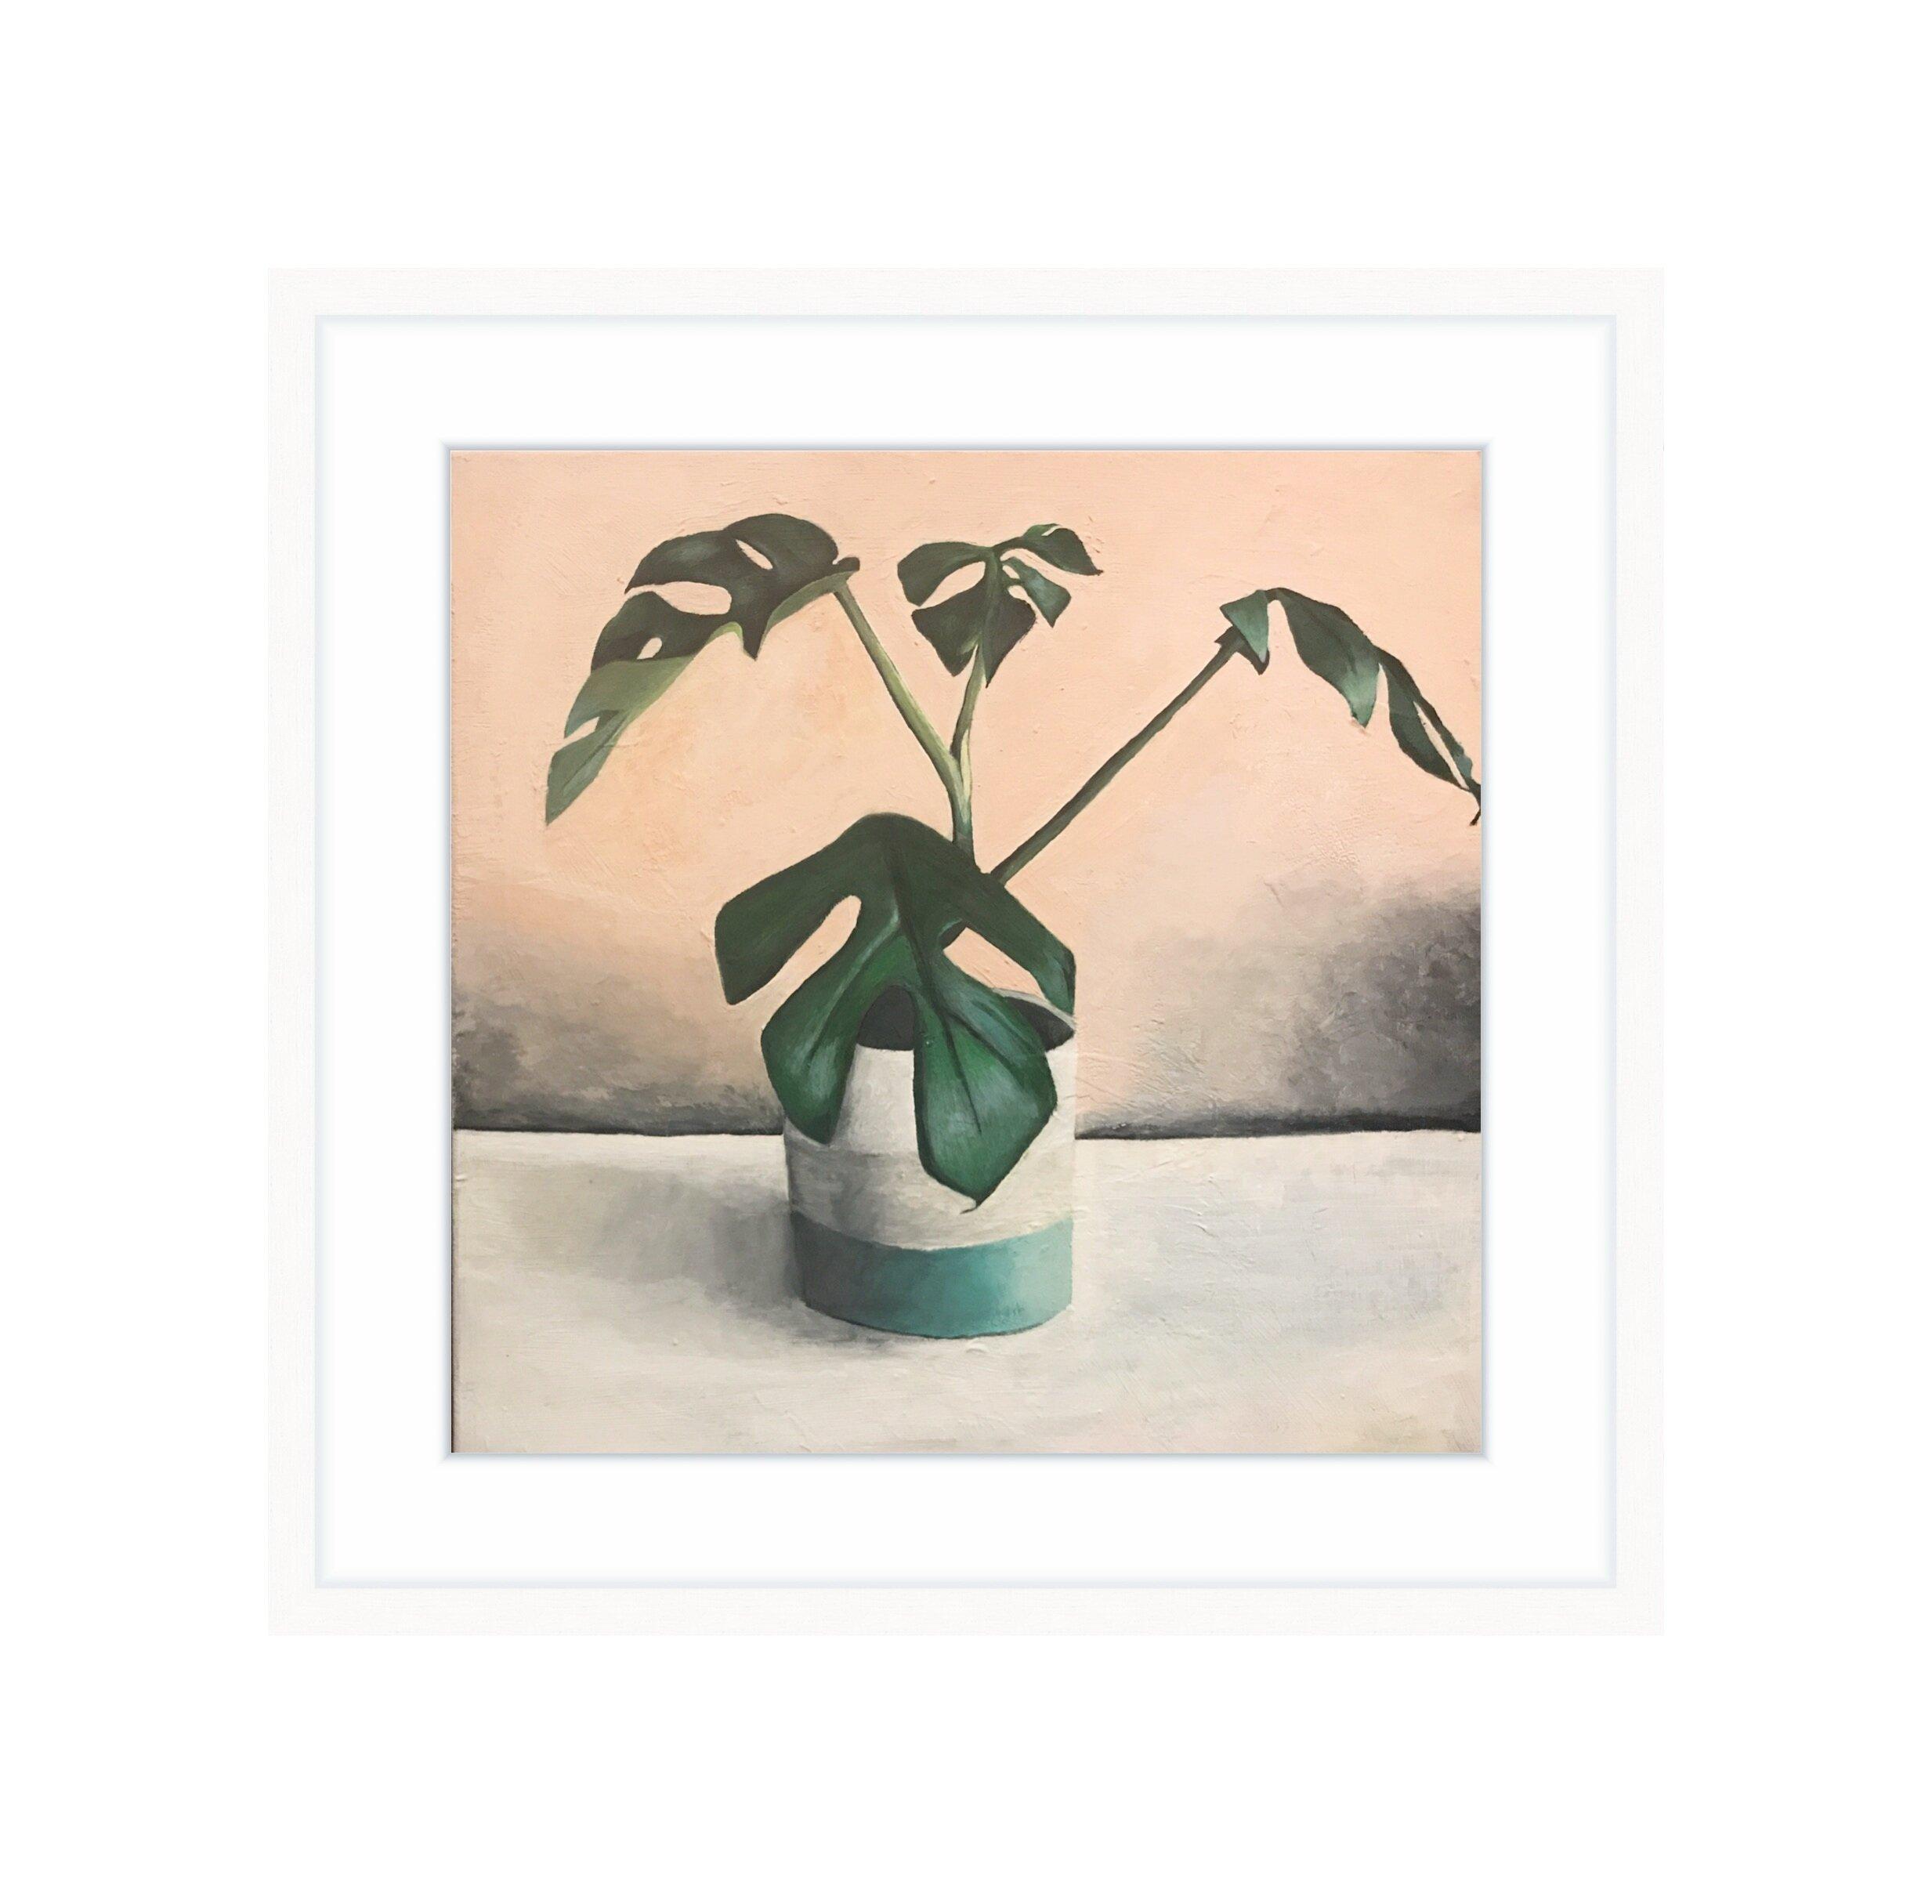 Rhaphidophora Tetrasperma   acrylic on canvas 12 in x 12 in / 30.48 cm x 30.48 cm